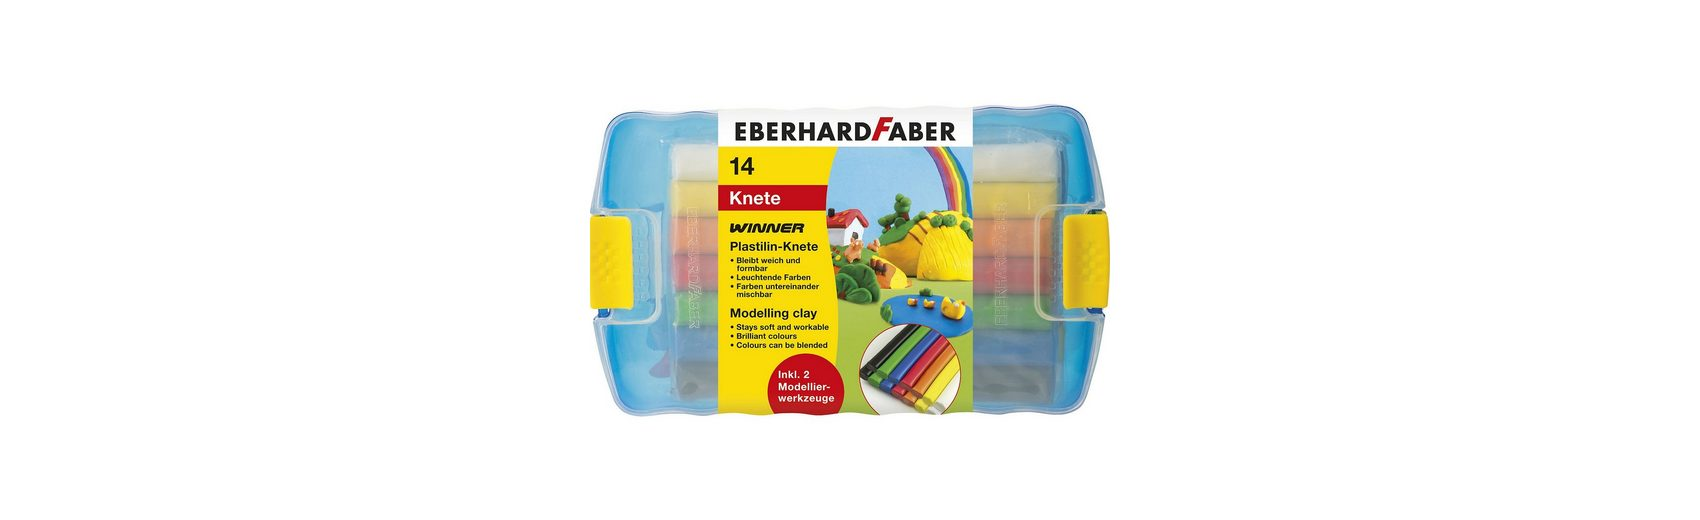 Eberhard Faber Plastilin-Knete, 10 Stangen, inkl. Werkzeug